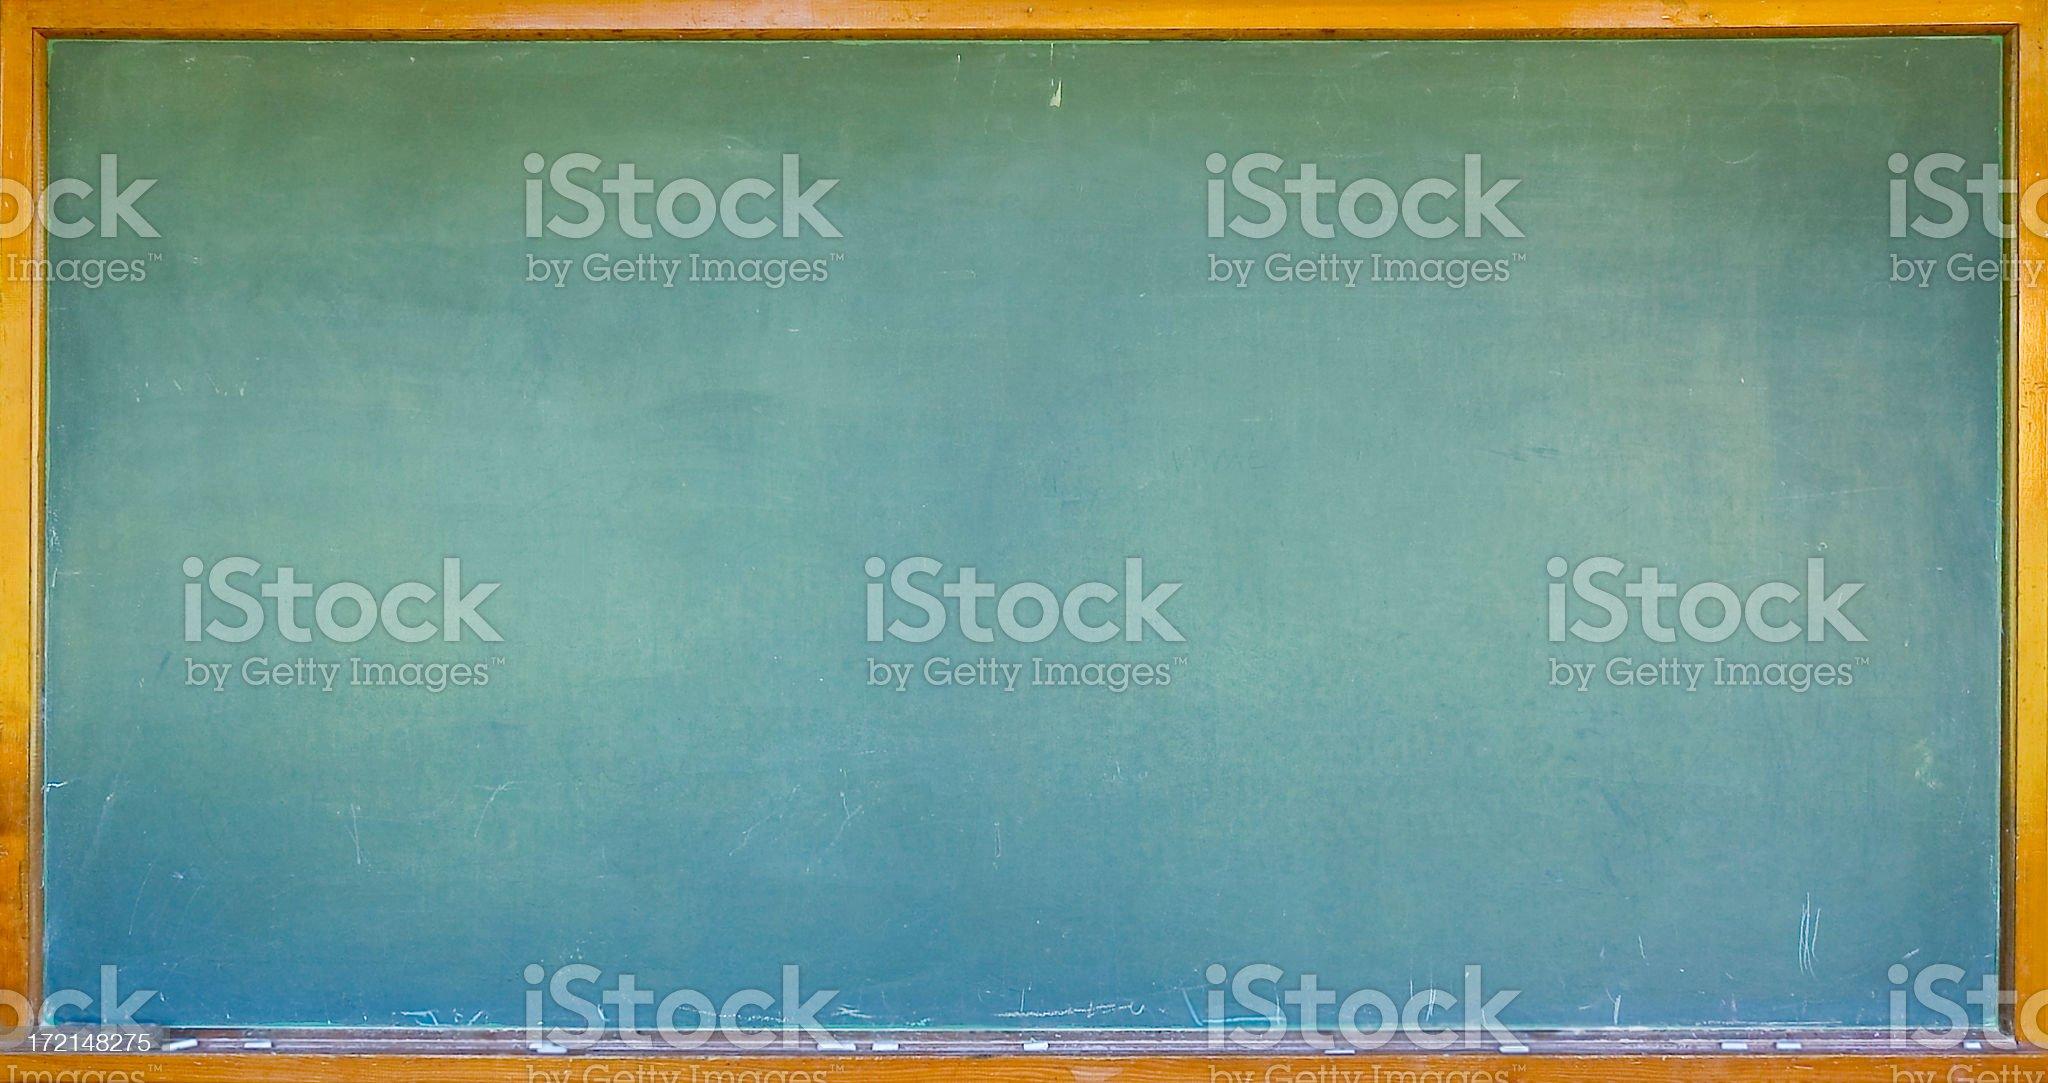 Blank chalkboard/blackboard with wooden frame royalty-free stock photo